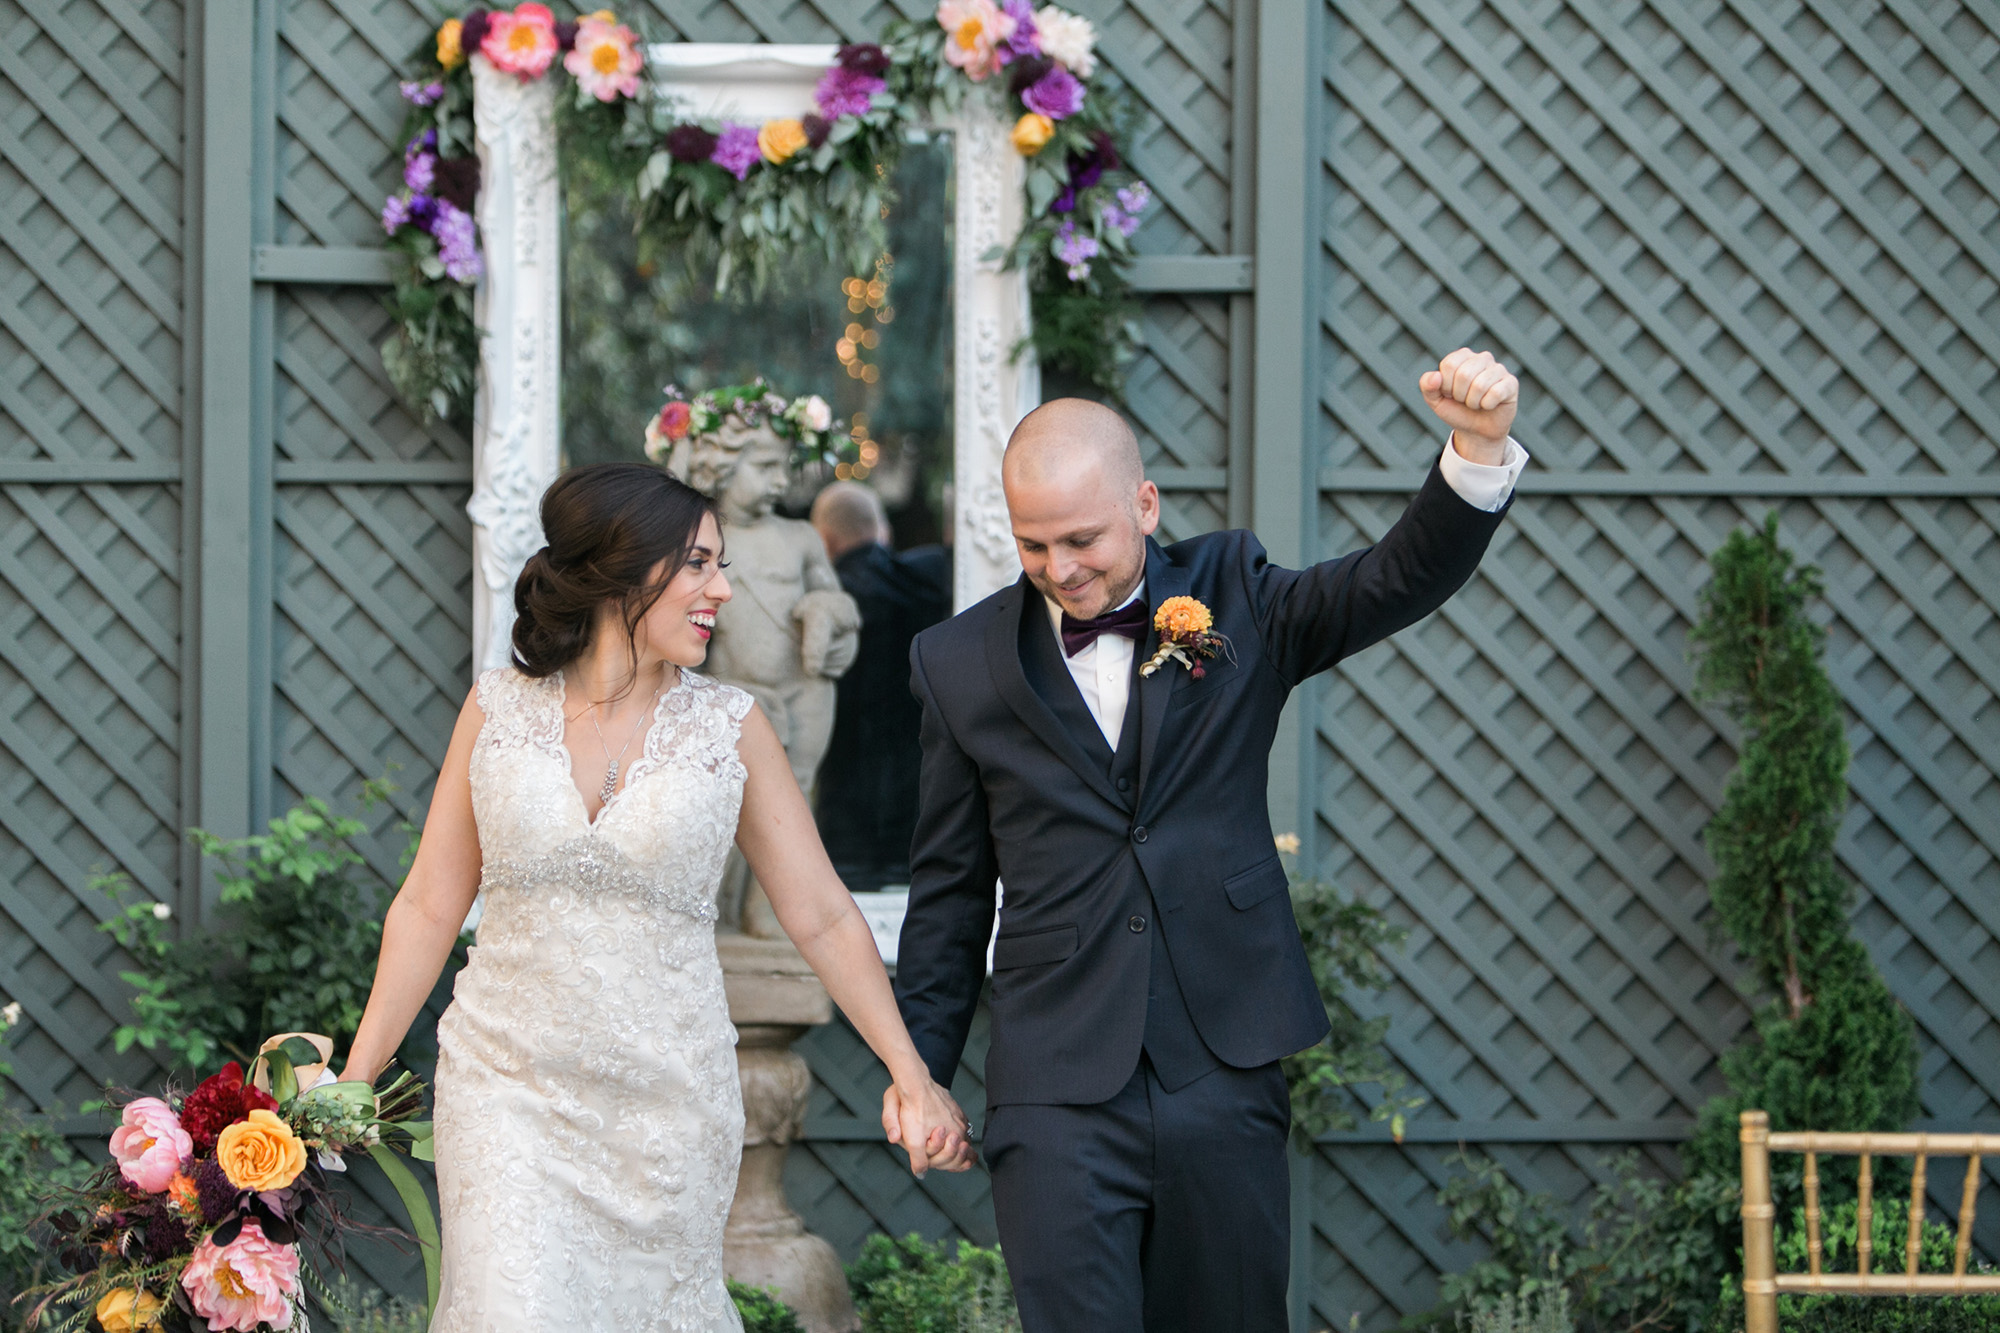 christmas-house-weddings-receptions-carrie-vines-154.jpg